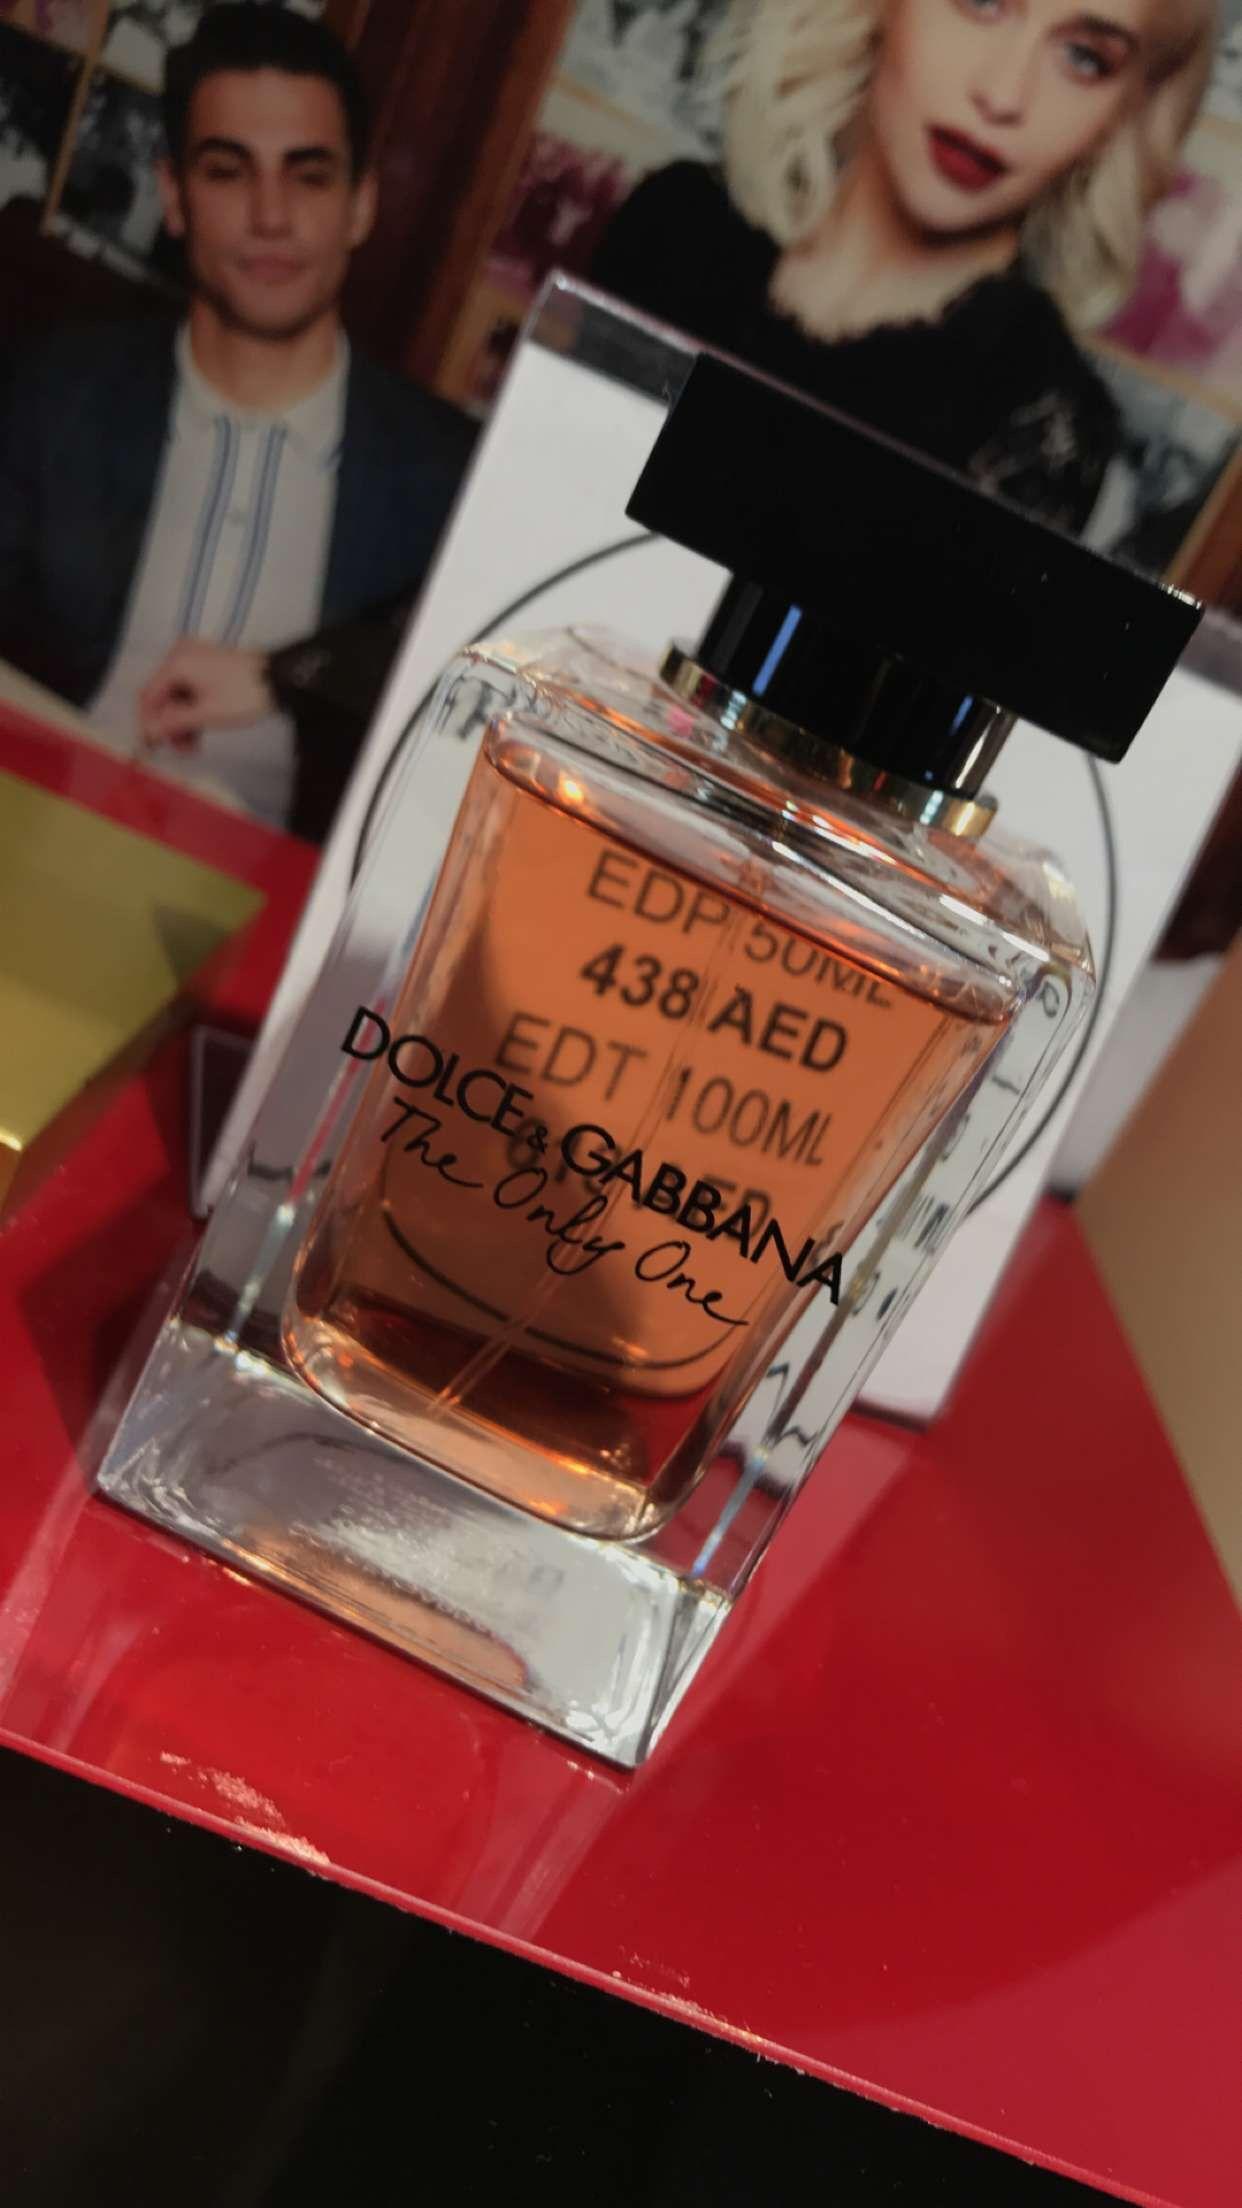 Pin by shomooo3 almatar on fashion Perfume, Perfume